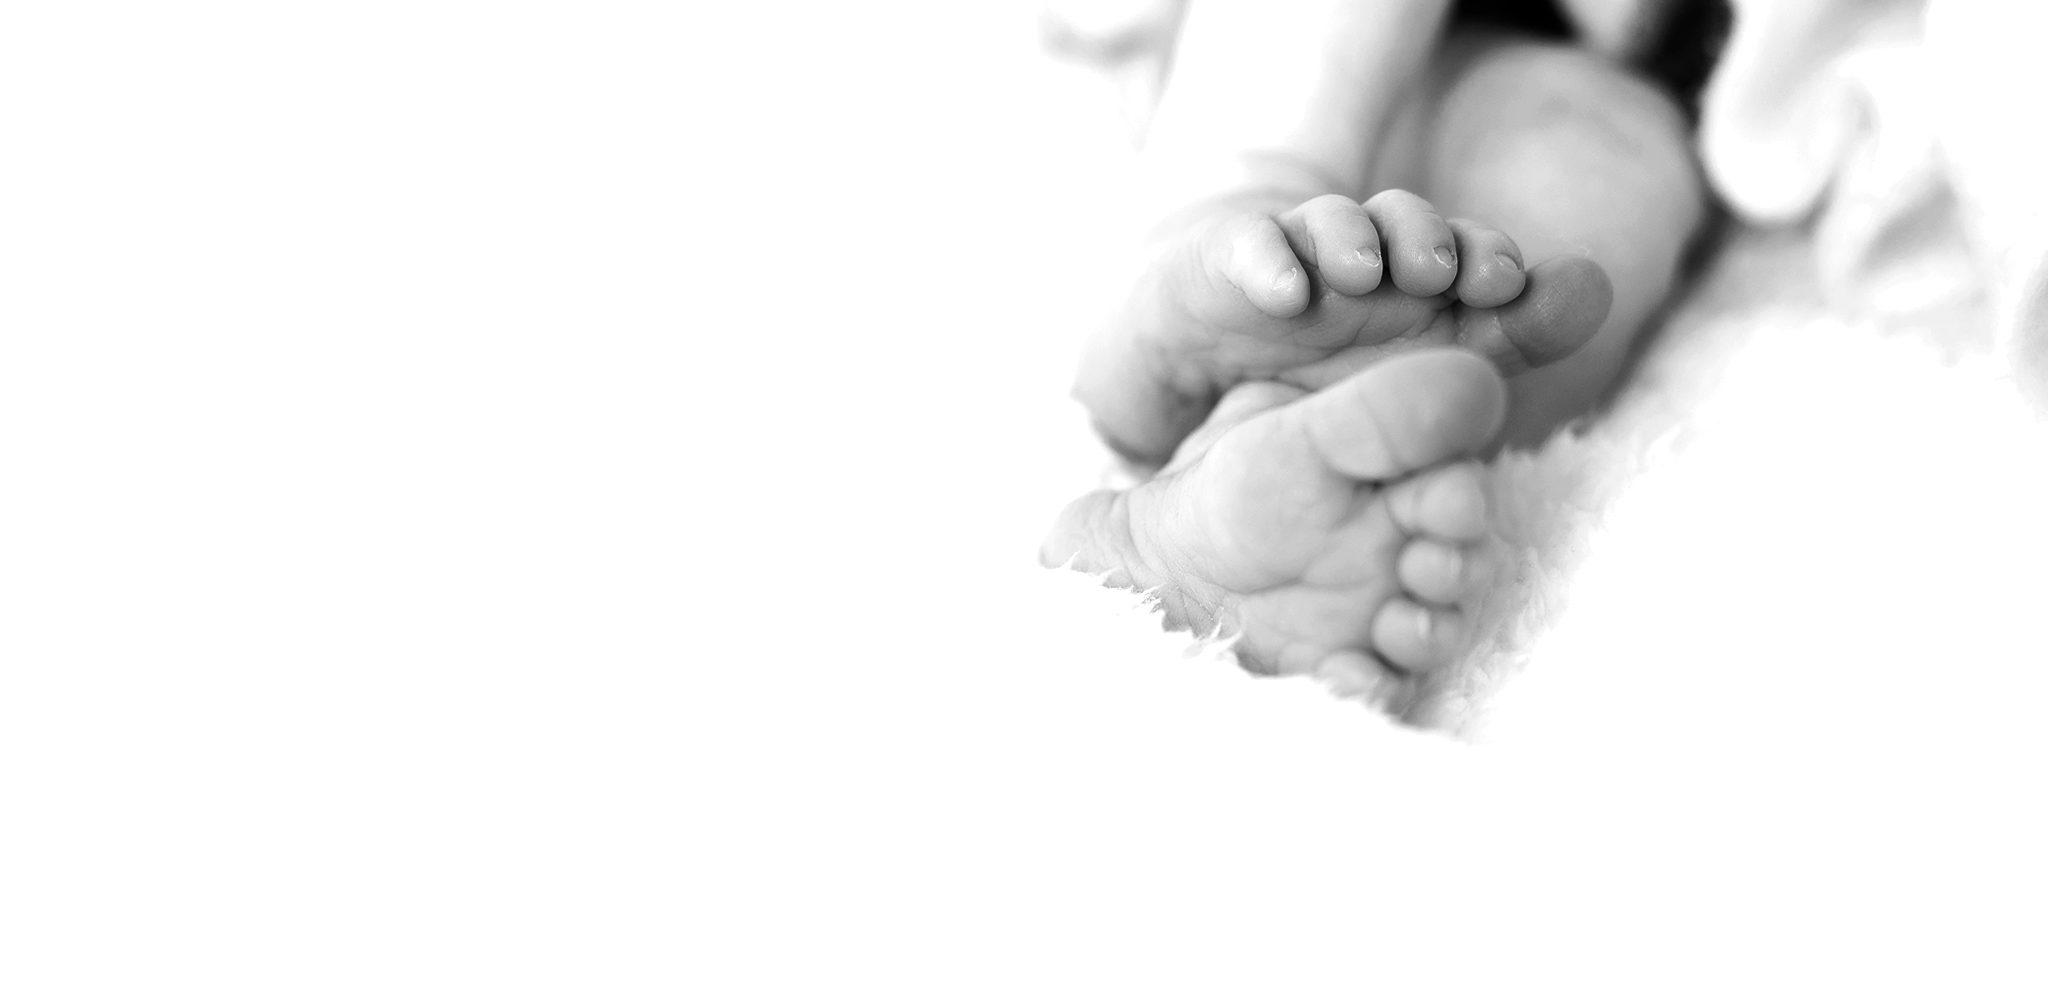 Newborn-4